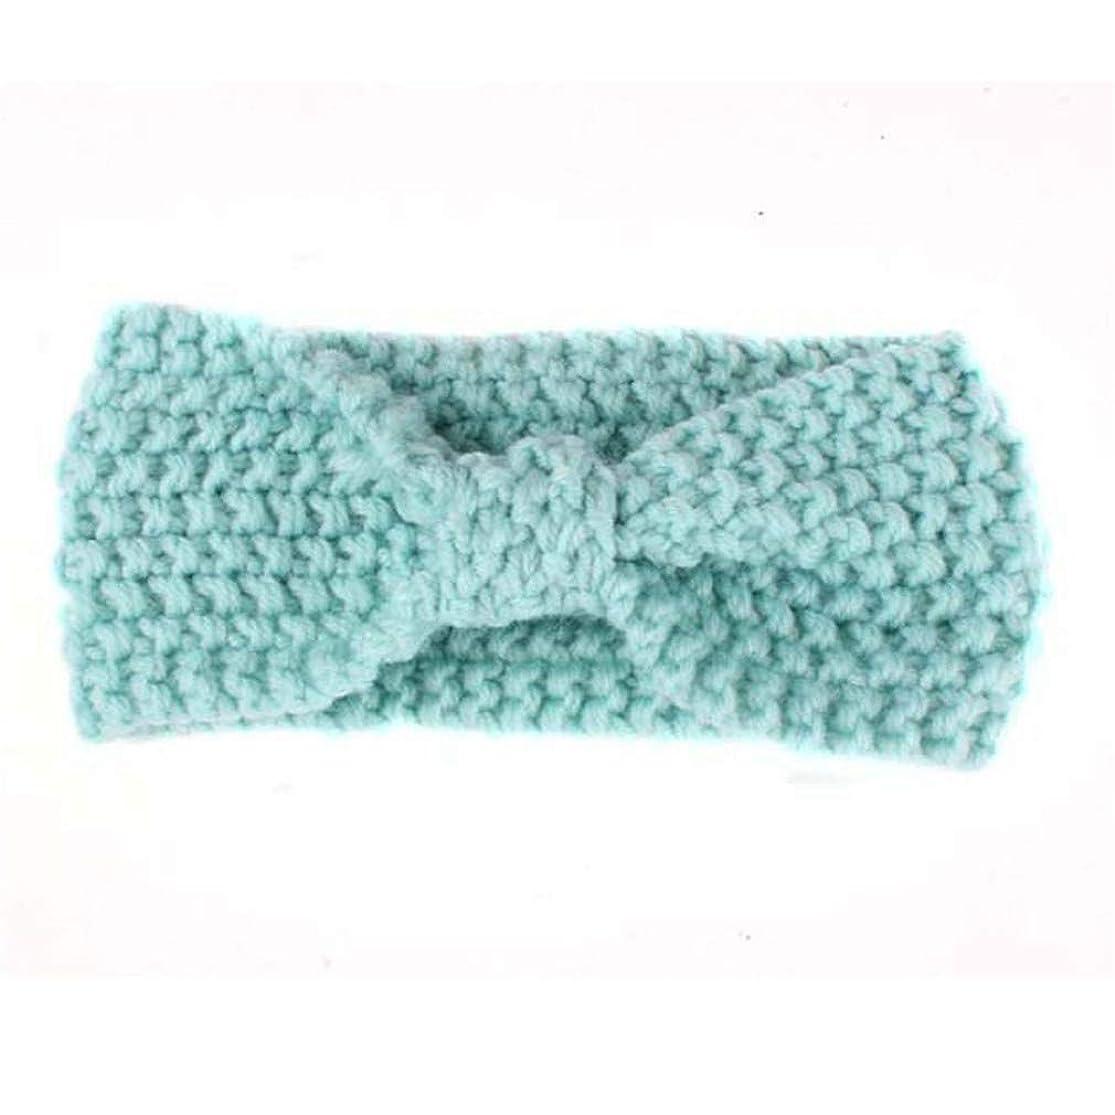 New Knit Headband Crochet Top Knot Elastic Turban Girls Head Wrap Ears Warmer Headwear light blue mytnfadh9